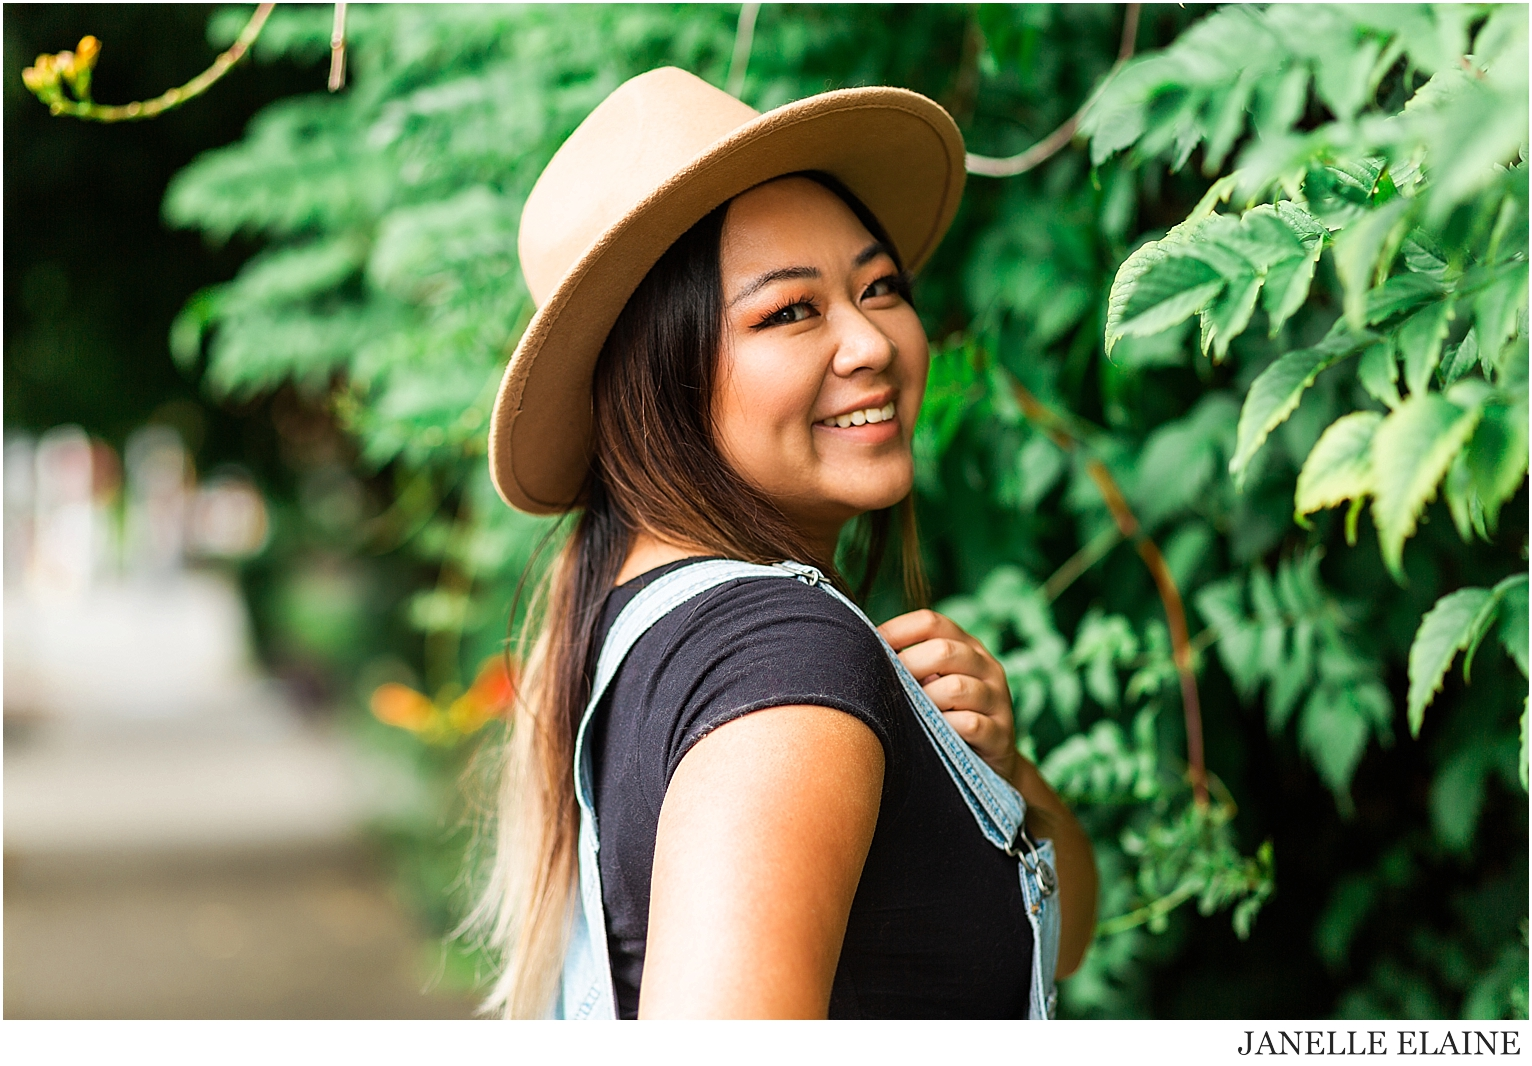 Aiko-Seattle WA-lifestyle photoshoot-Renton-Janelle Elaine Photography-2.jpg